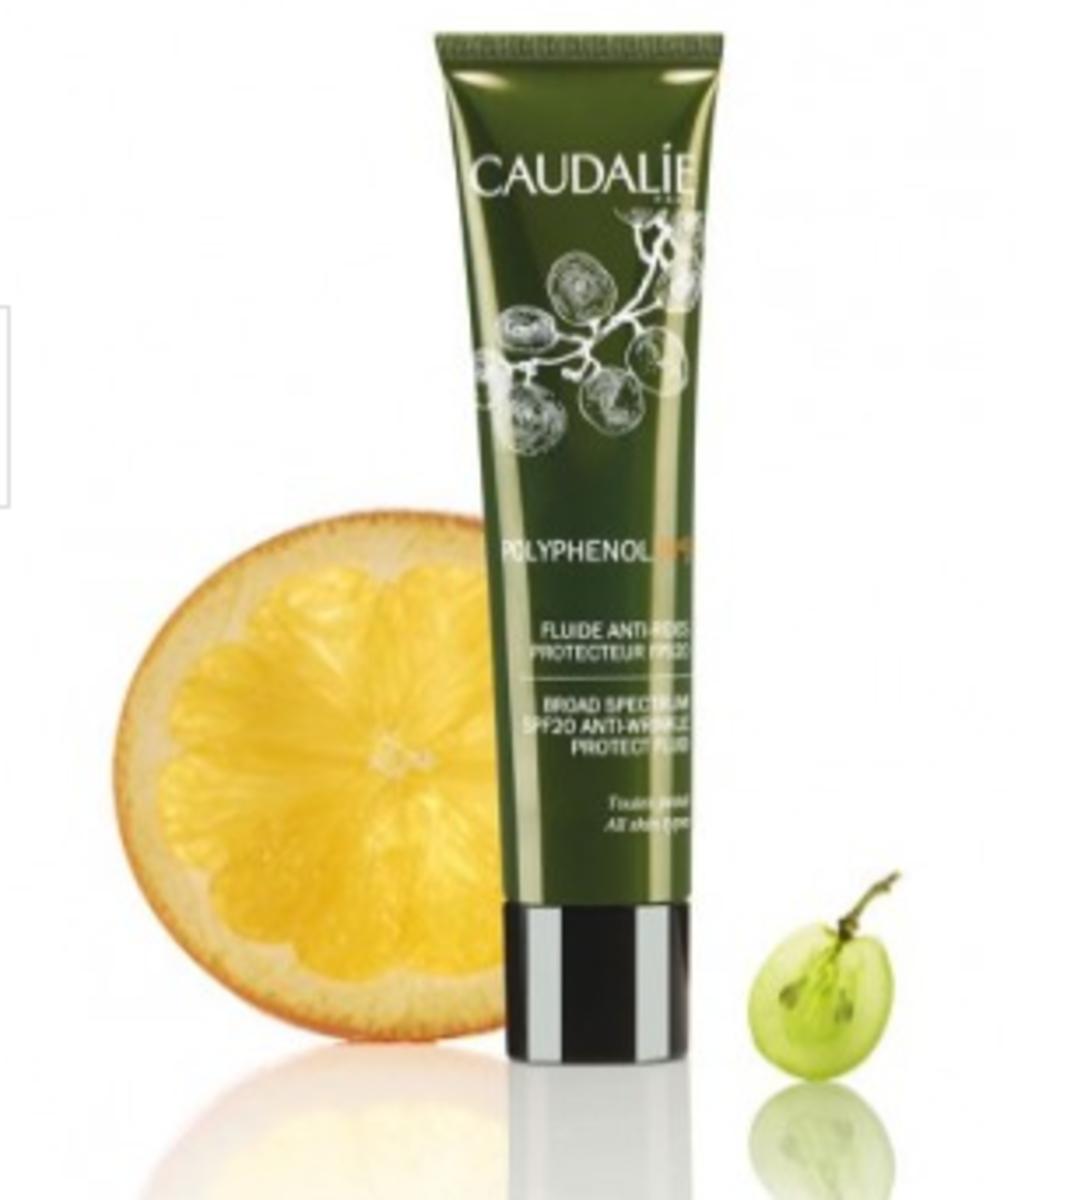 Caudalie Polyphenol c15 Broad Spectrum SPF 20 Anti-Wrinkle Protect Fluid